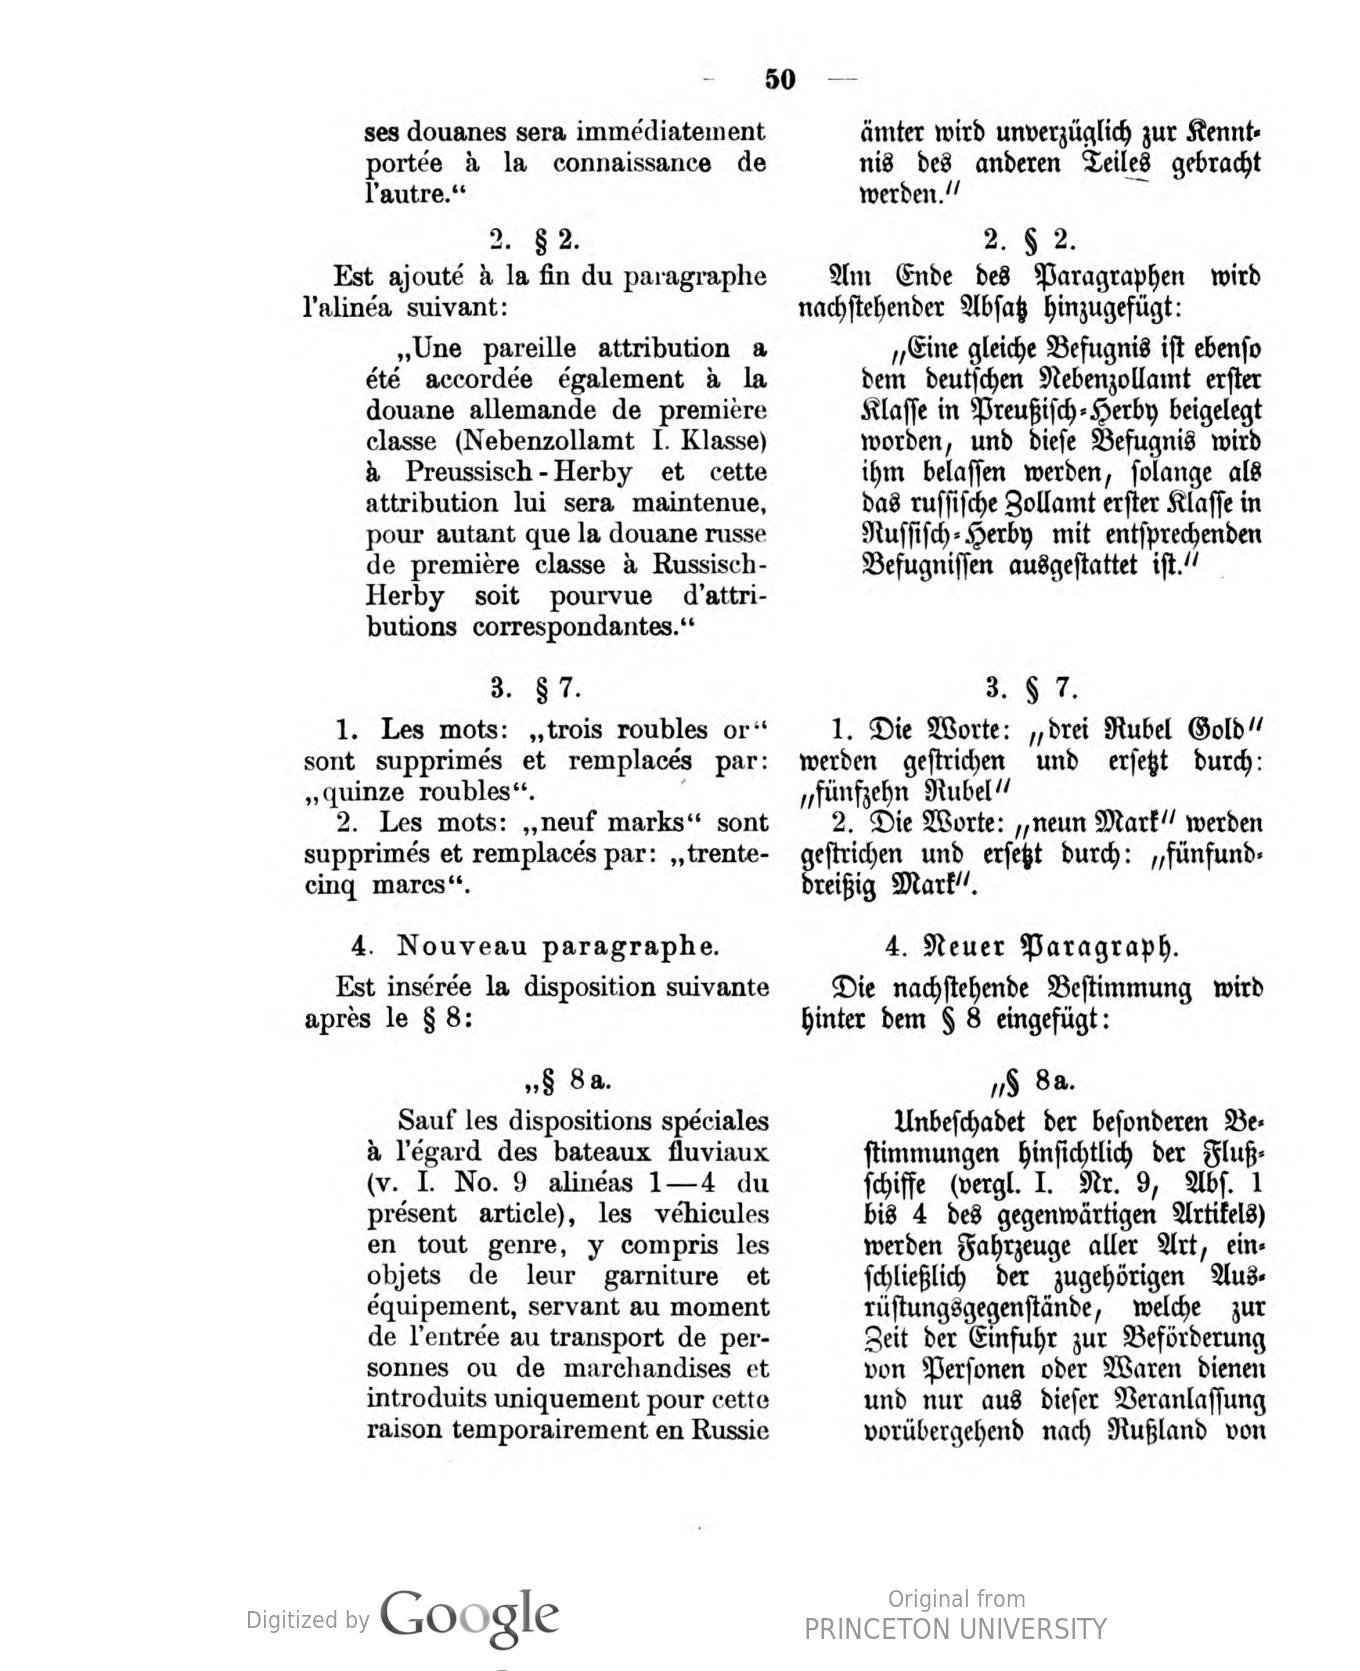 File Deutsches Reichsgesetzblatt 1905 007 050.jpg - Wikimedia Commons 291fb8d6cba26